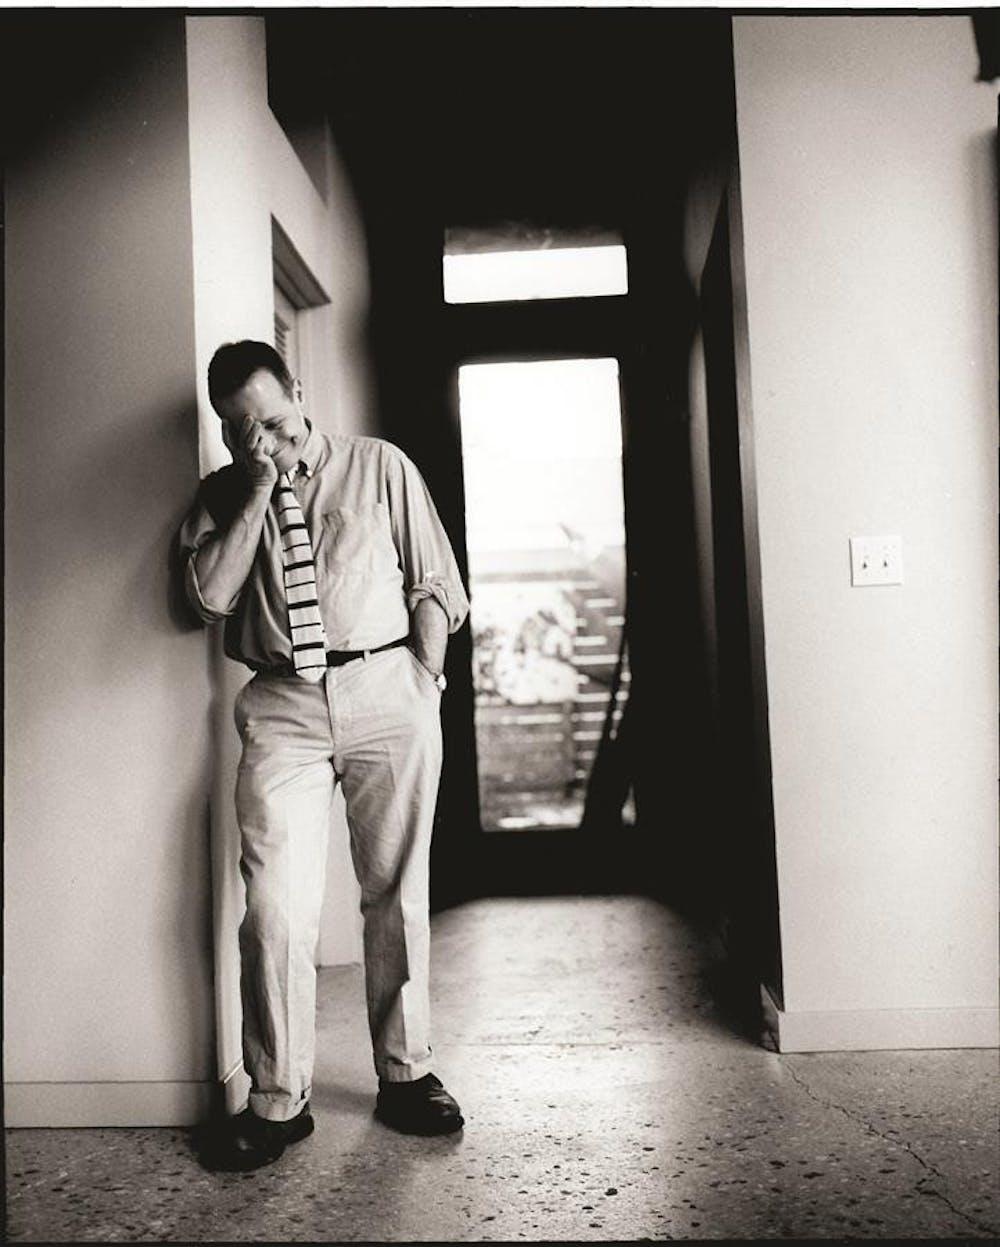 <p>On Thursday night, Comedian David Sedaris will perform various never-before-seen pieces at 8 p.m. at the IU Auditorium.</p>